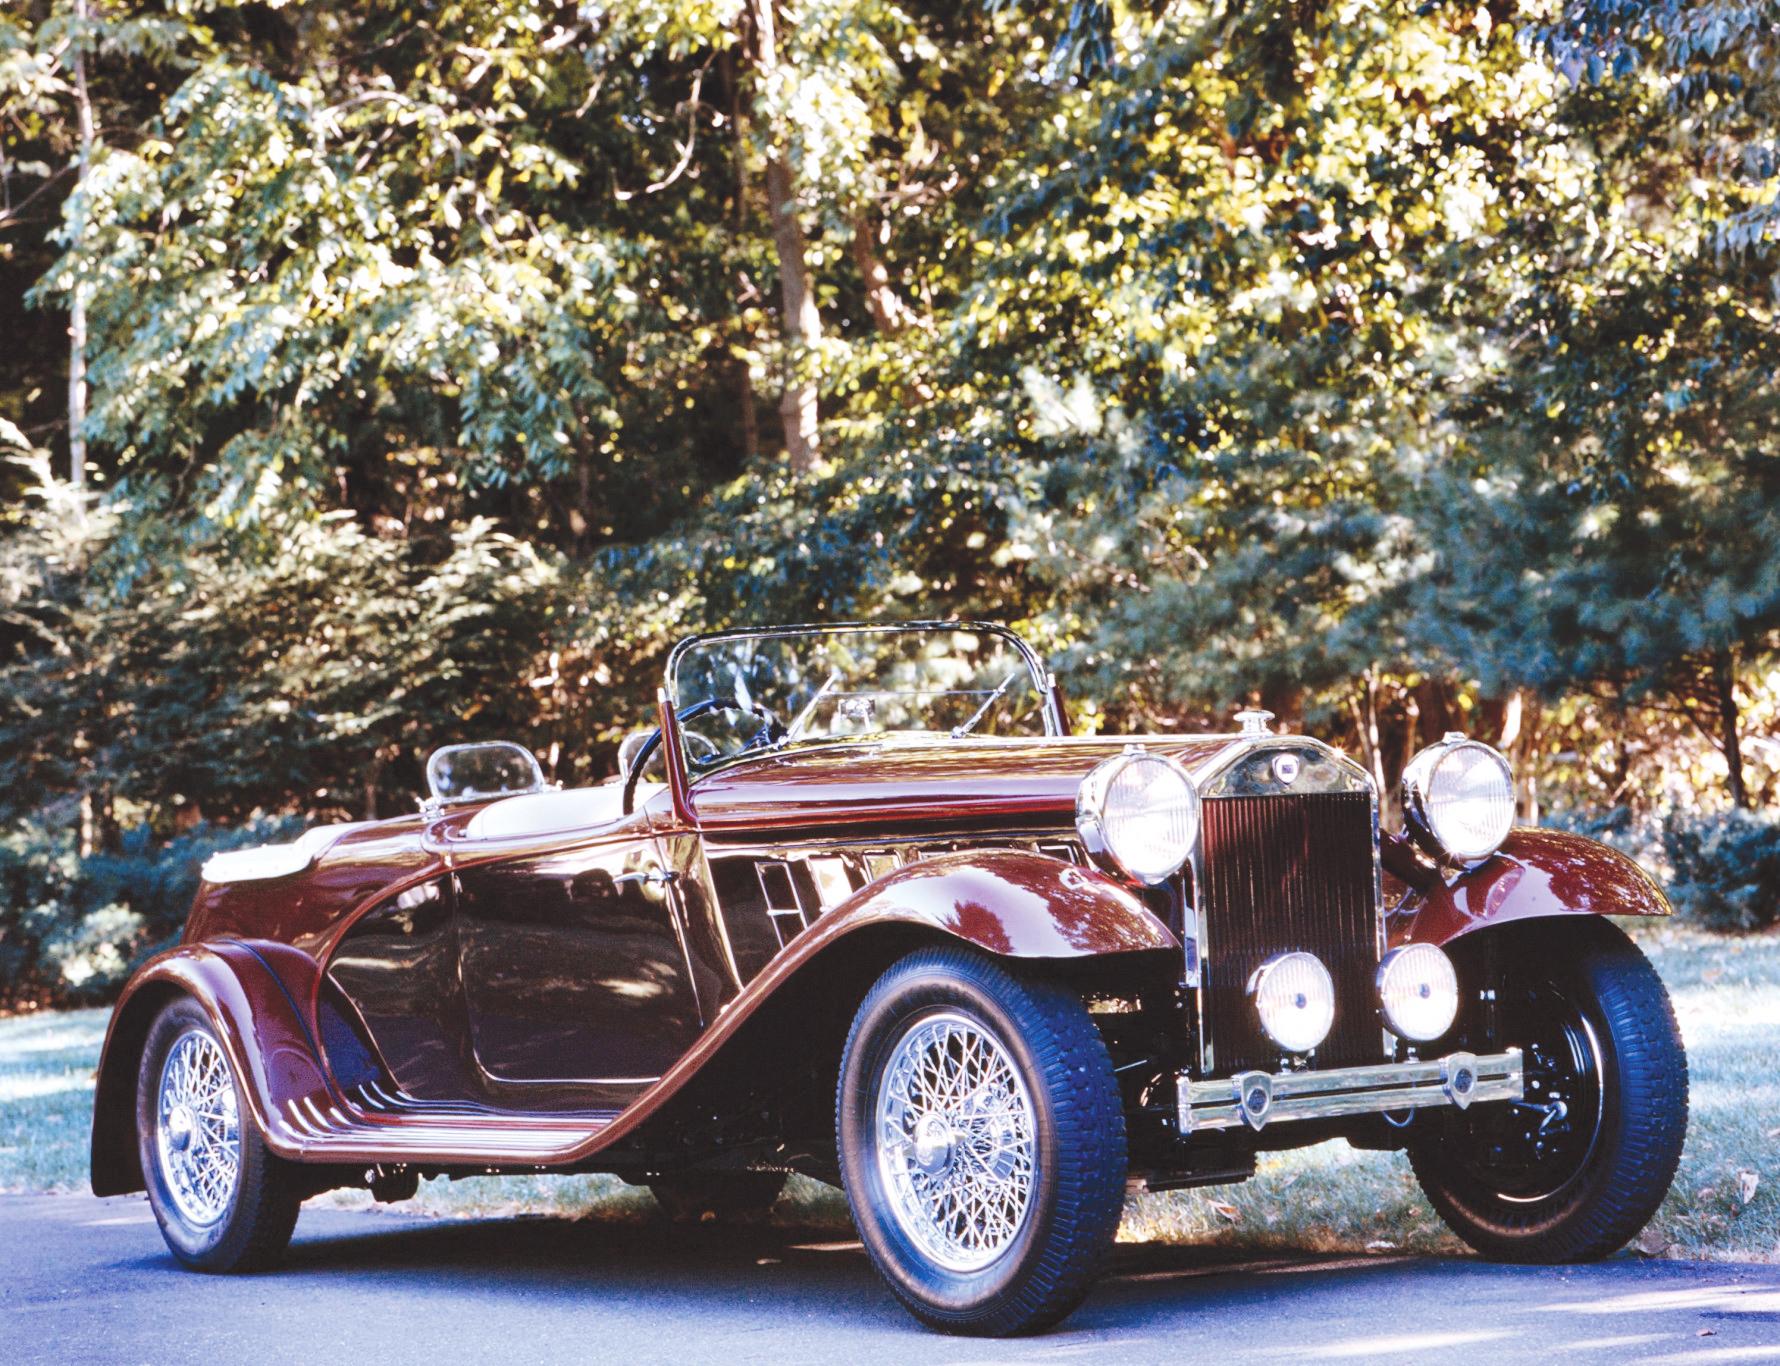 http://www.carstyling.ru/resources/studios/1933-Castagna-Lancia-Dilambda-Viotti-Phaeton-01.jpg